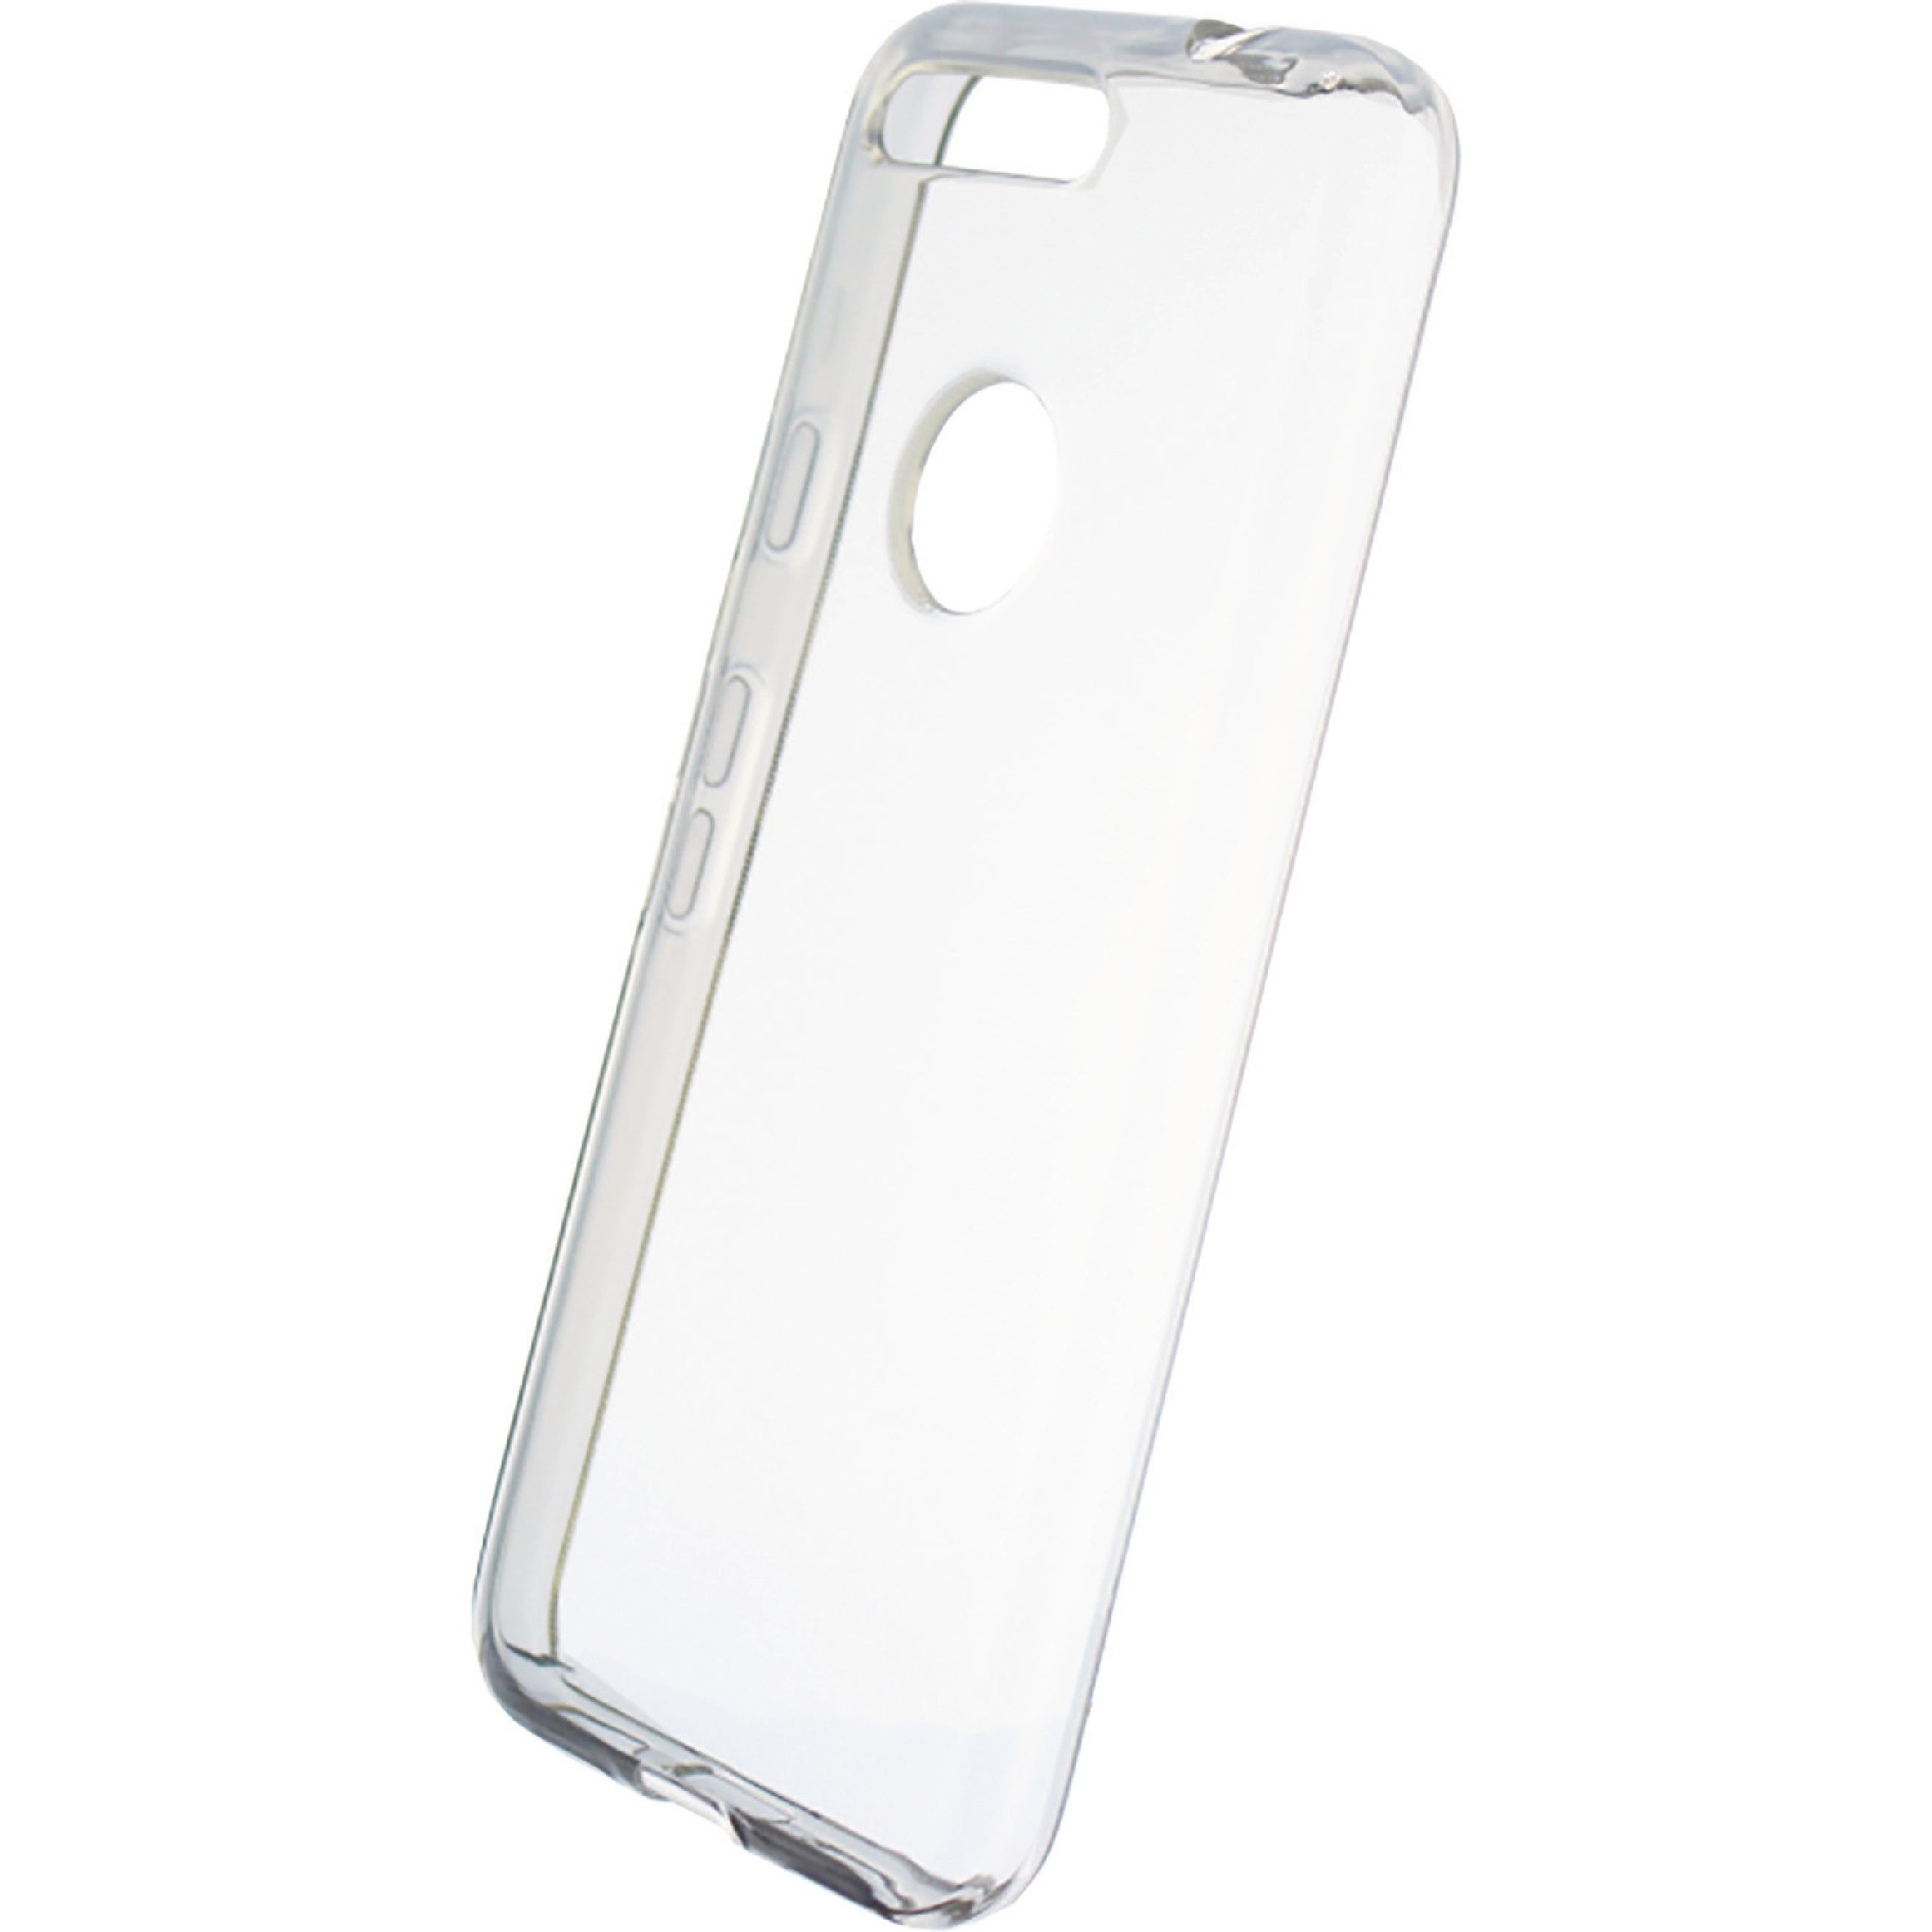 Image of   Telefon Gel-Etui Google Pixel XL Gennemsigtig